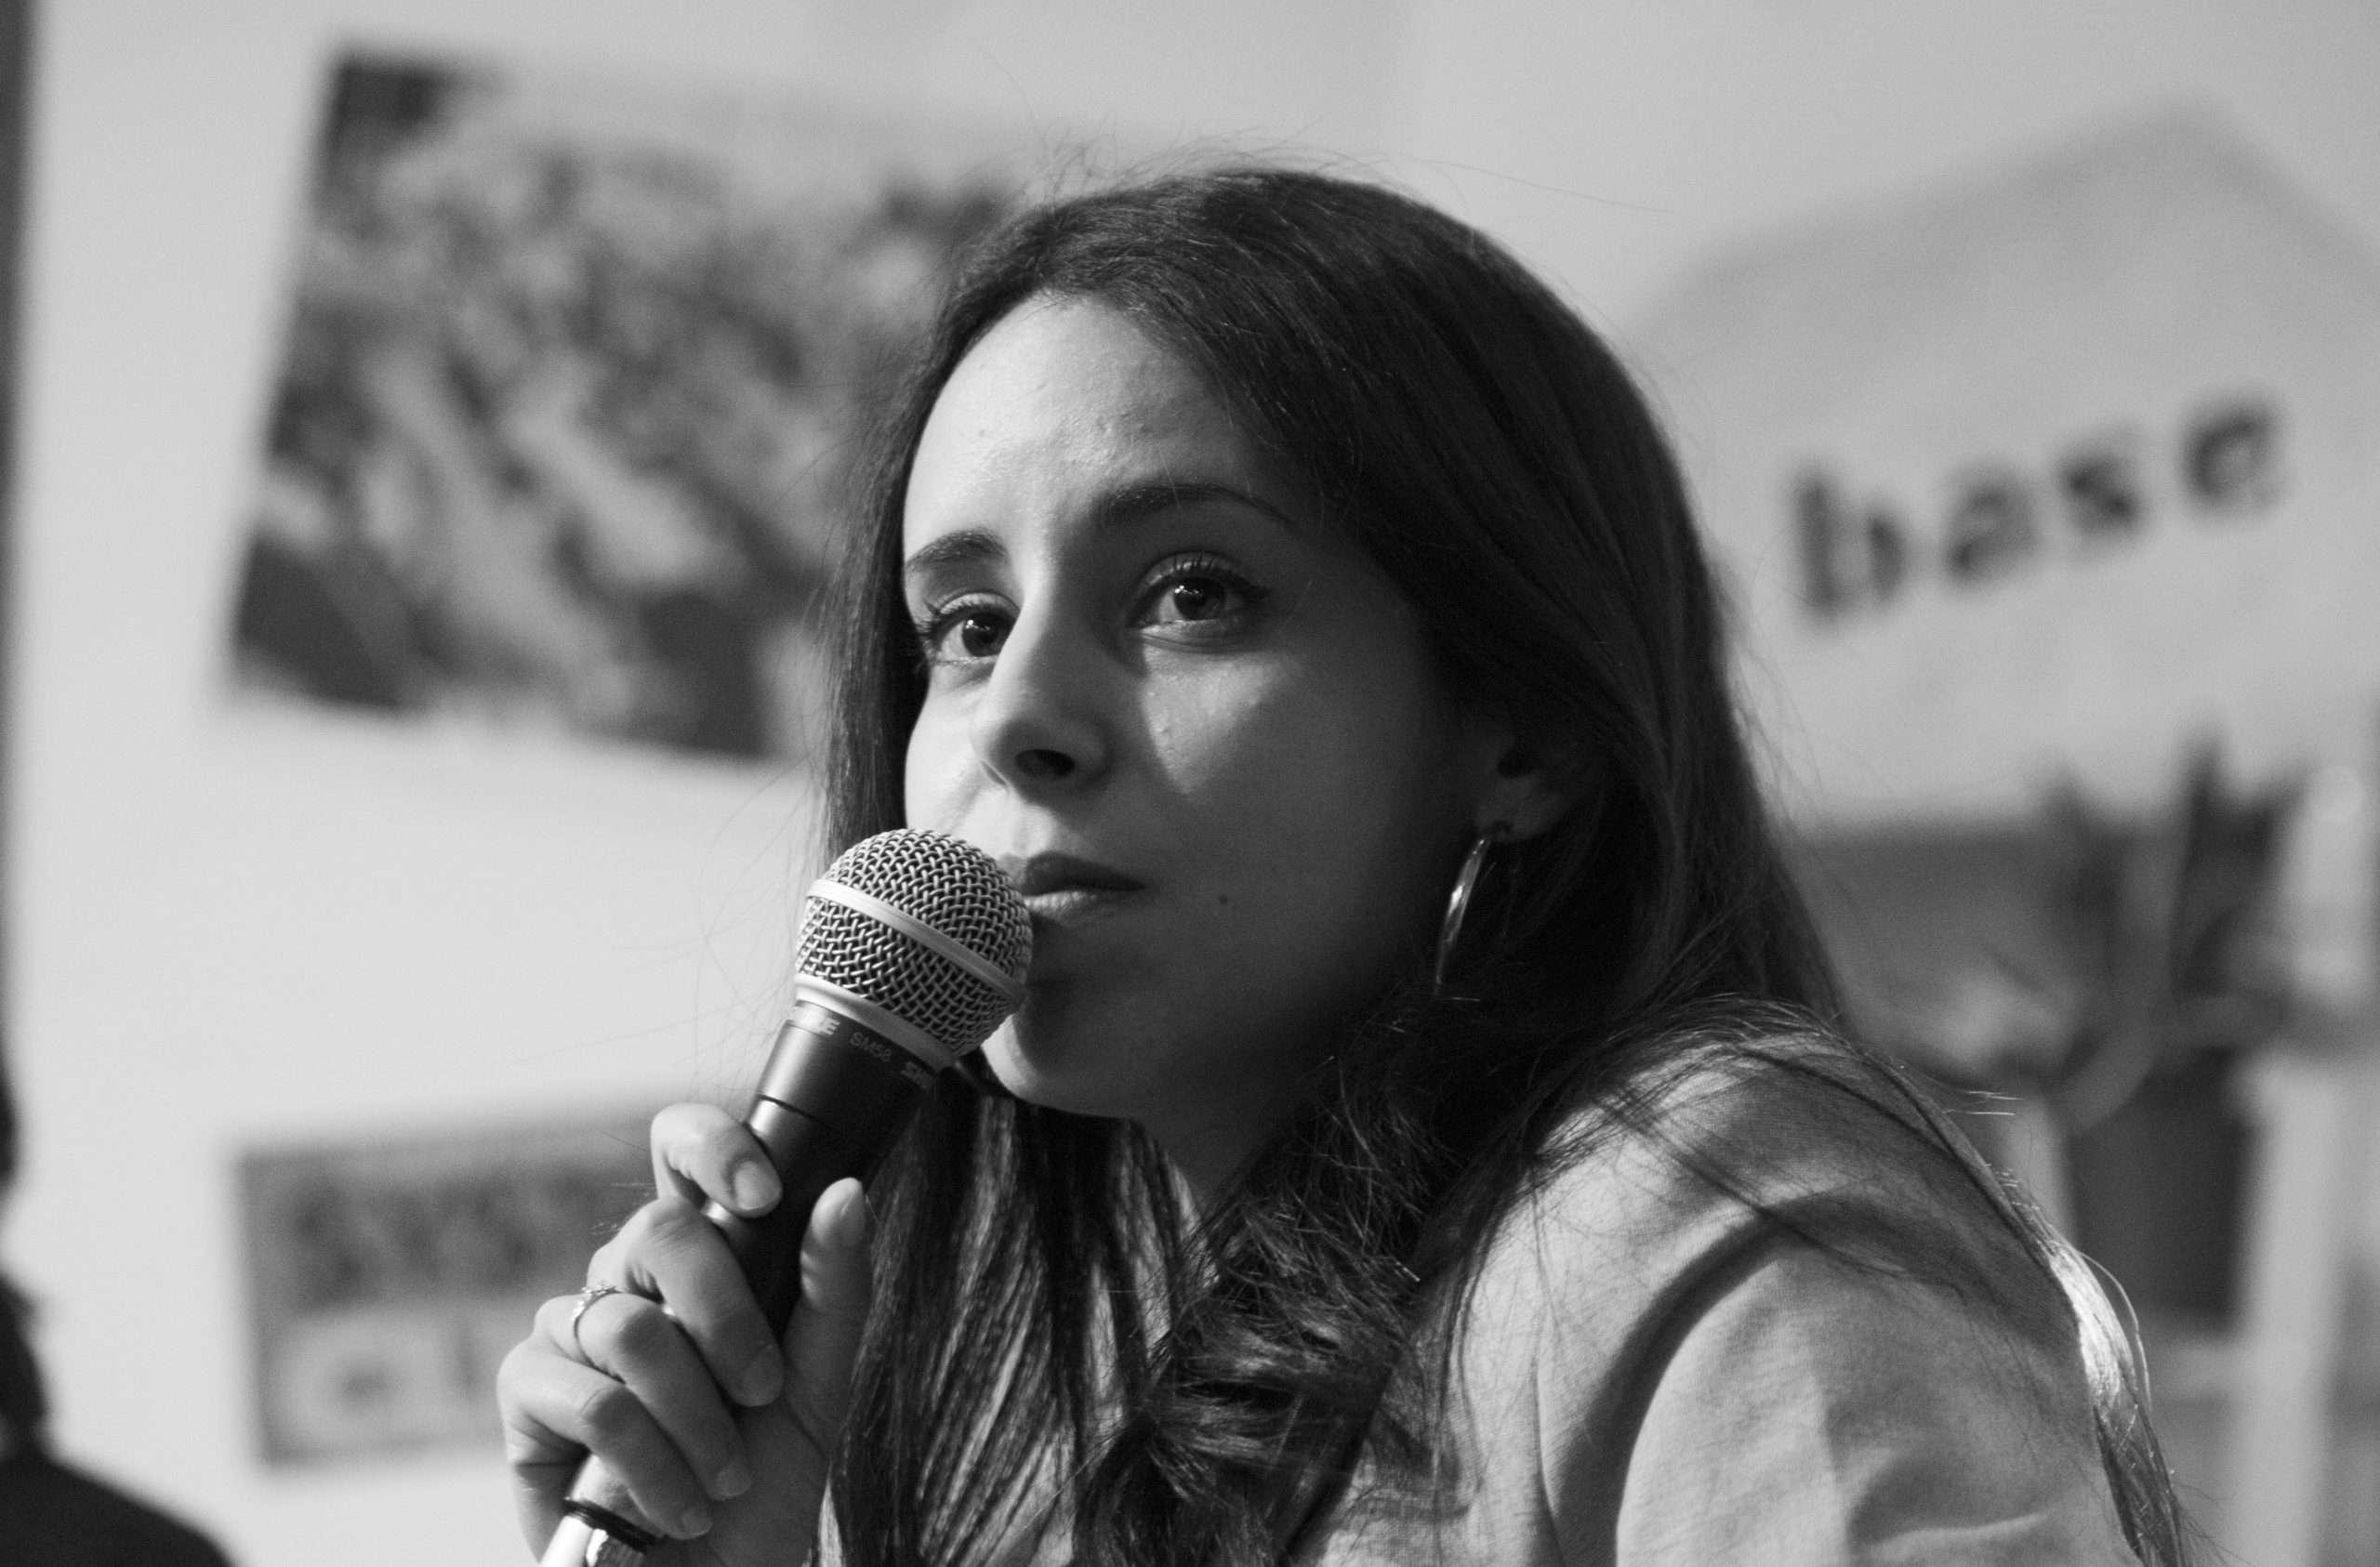 Teïssir Ghrab Conférence La Base Alternatiba Collectif Adama Paris 2020 @Martin Lelievre pour Radio Parleur_27